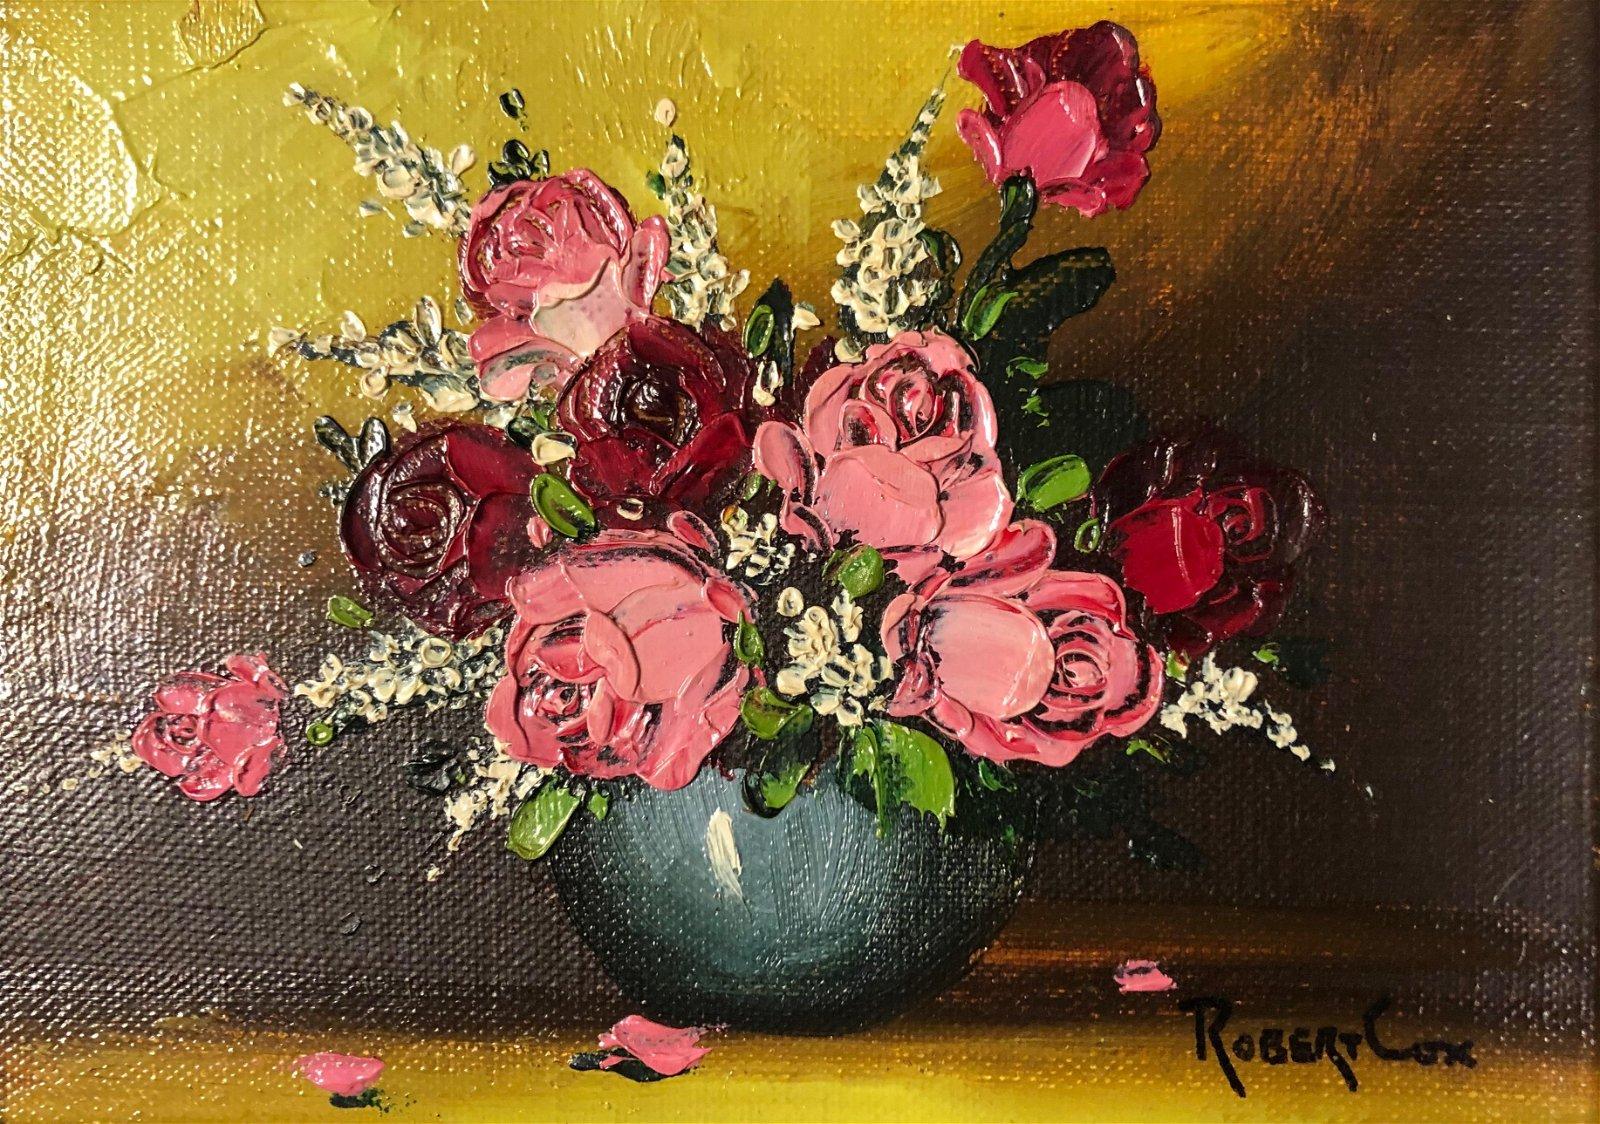 Robert Cox Floral Still Life Oil Painting